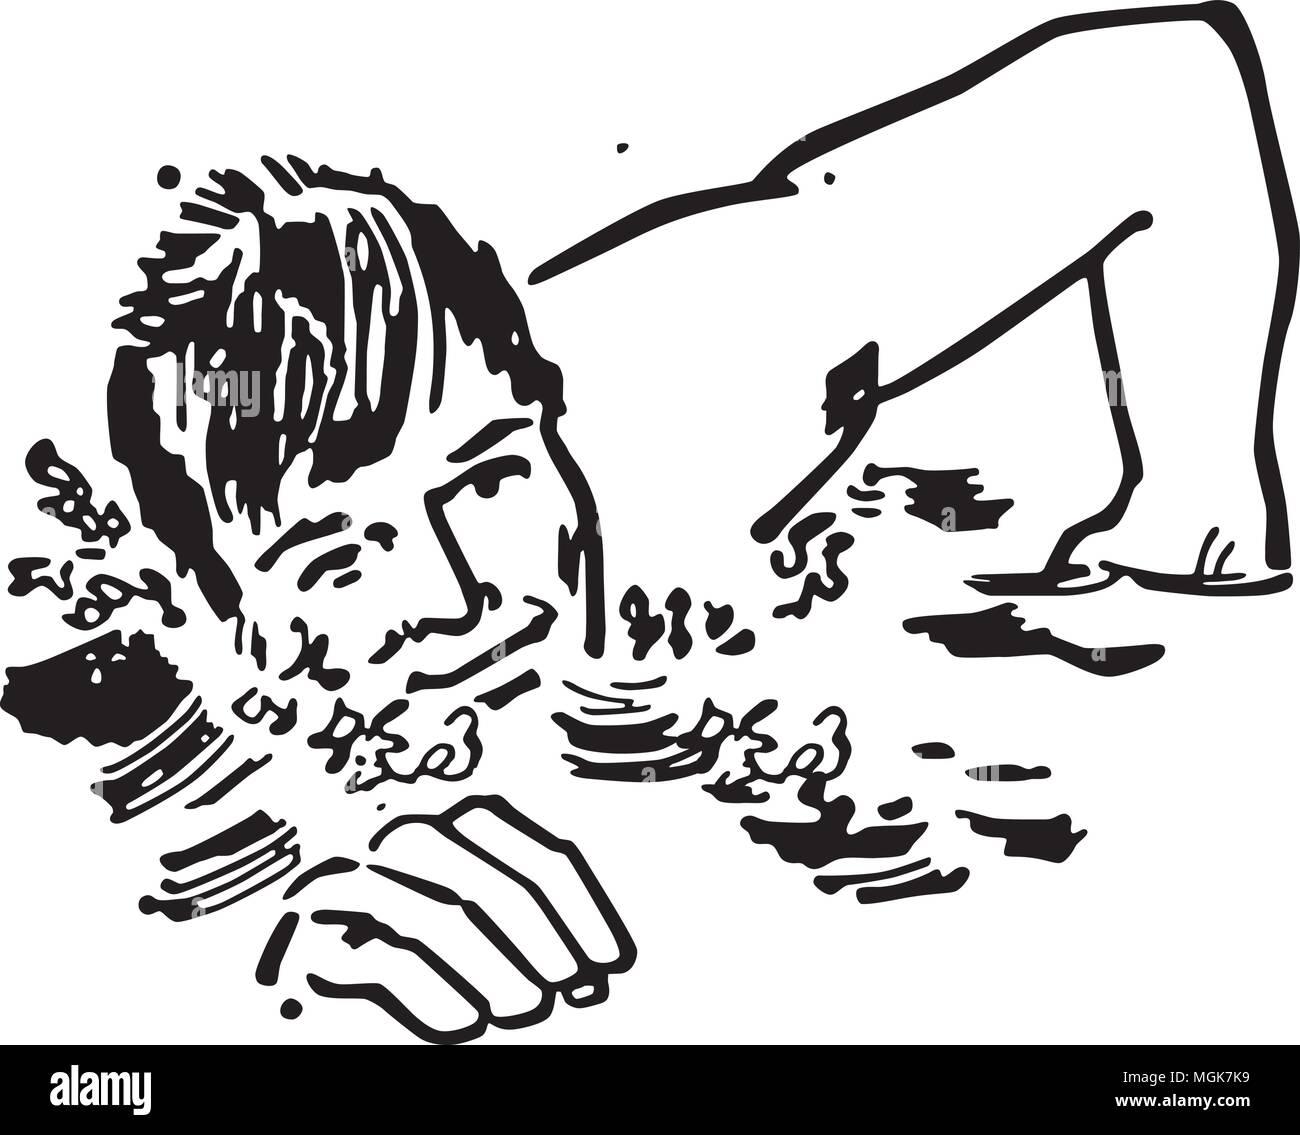 hight resolution of swimmer retro clipart illustration